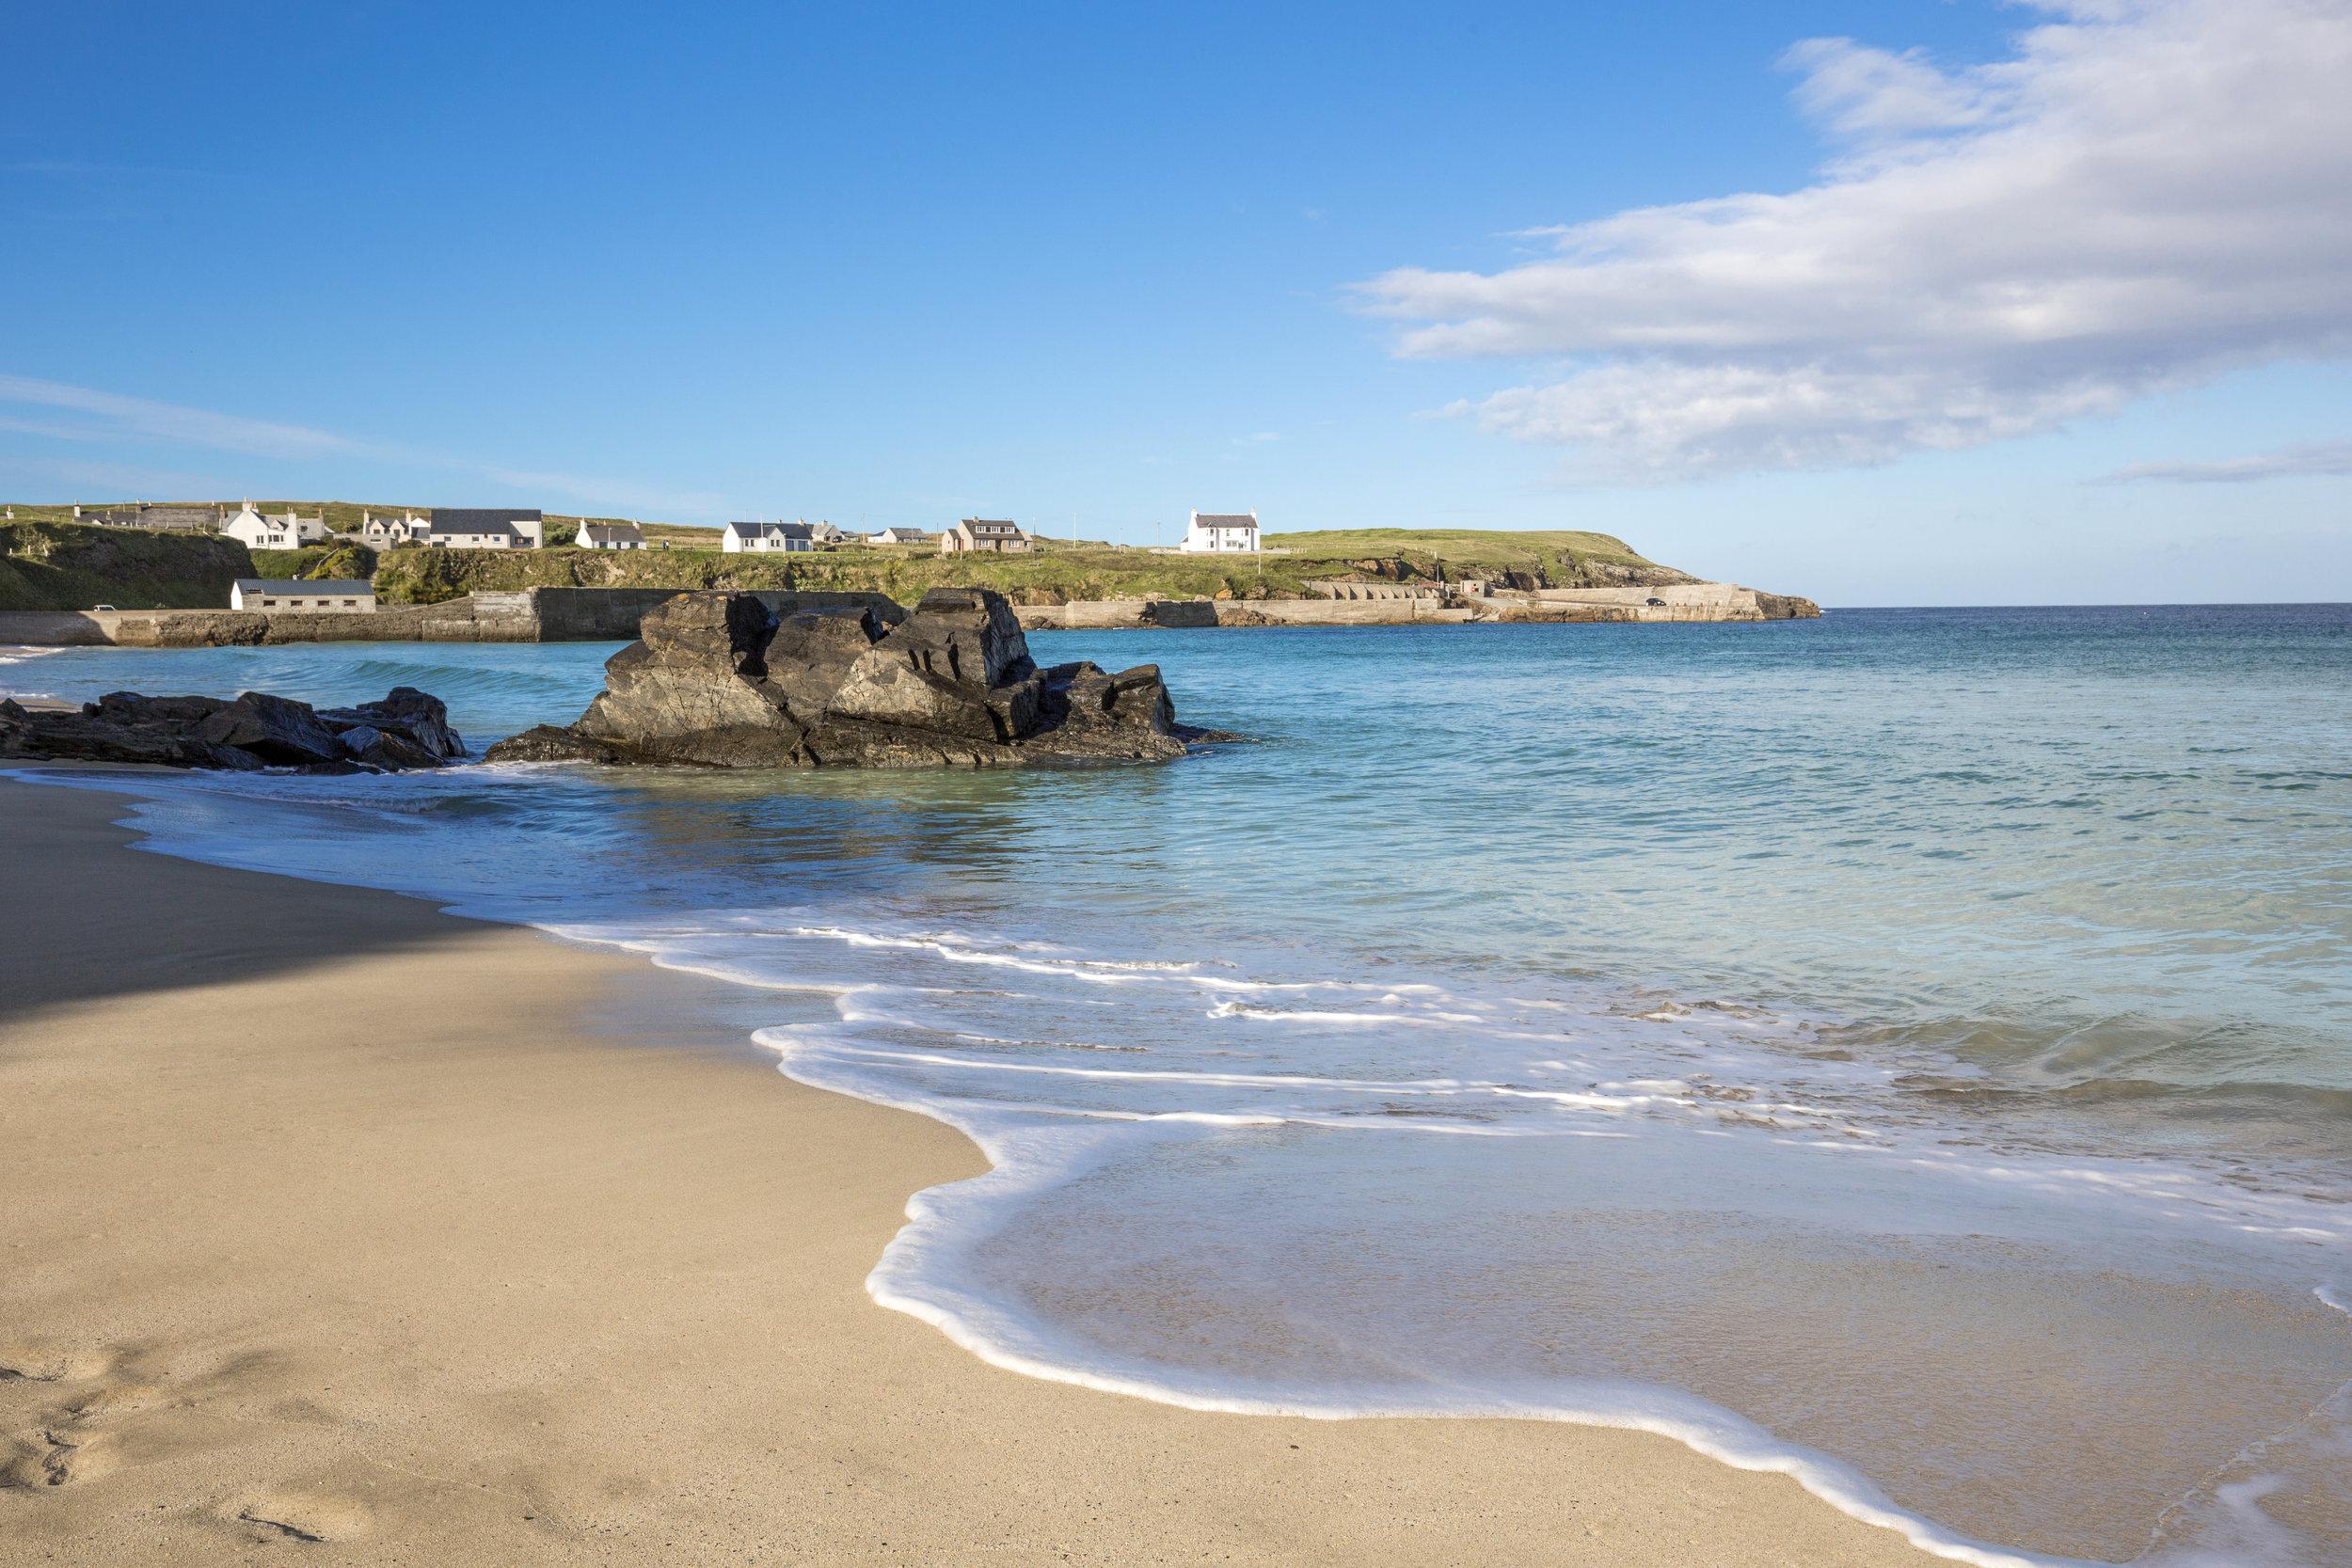 Ness beach visitscotland_38101841853.jpg